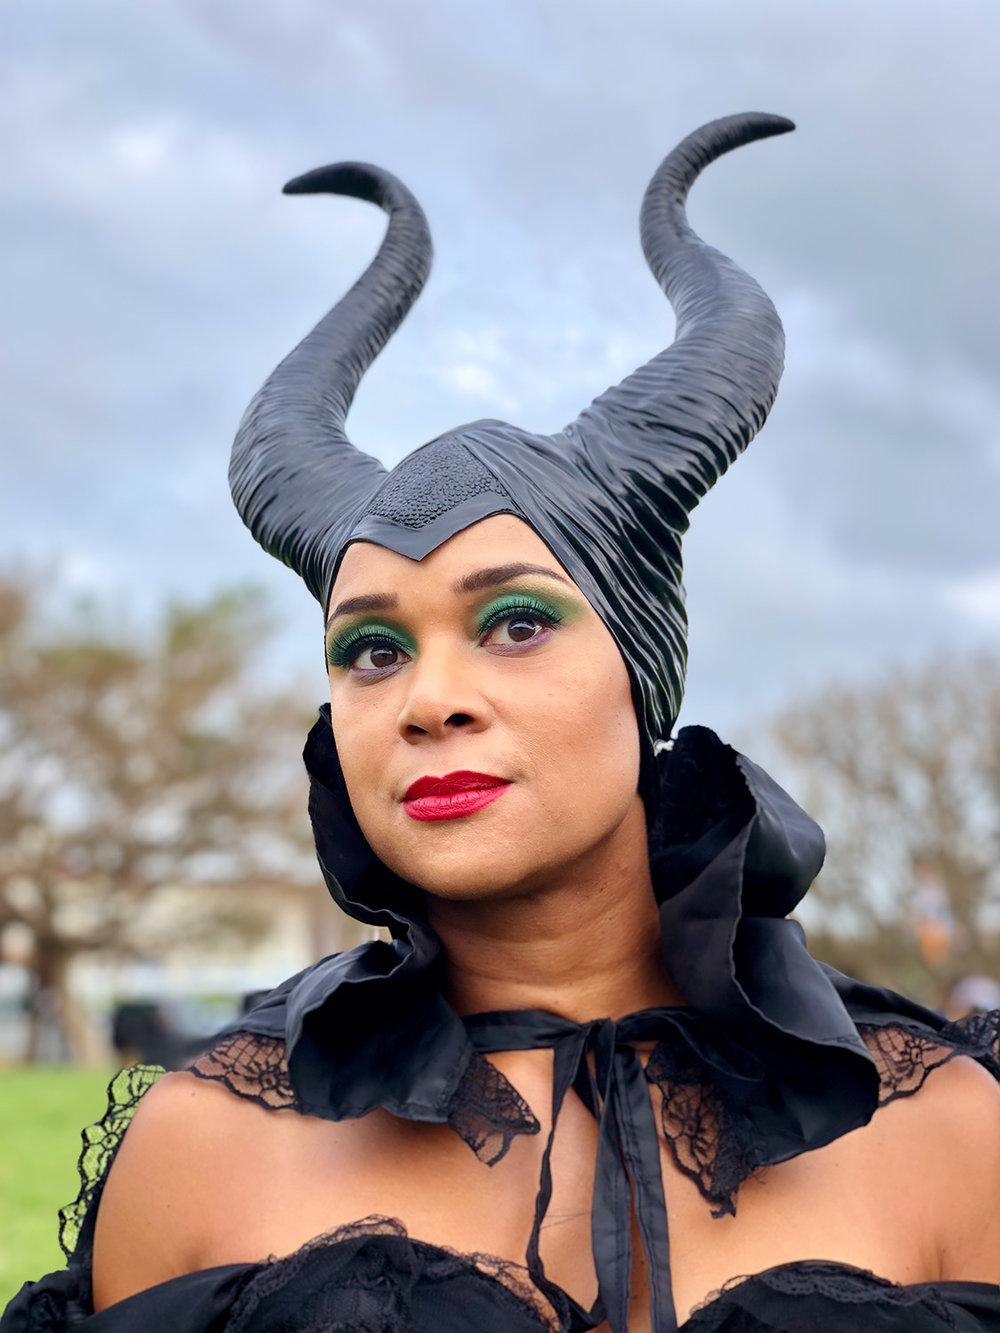 Maleficent #ShotOniPhone #ShotOniPhoneX using portrait mode.